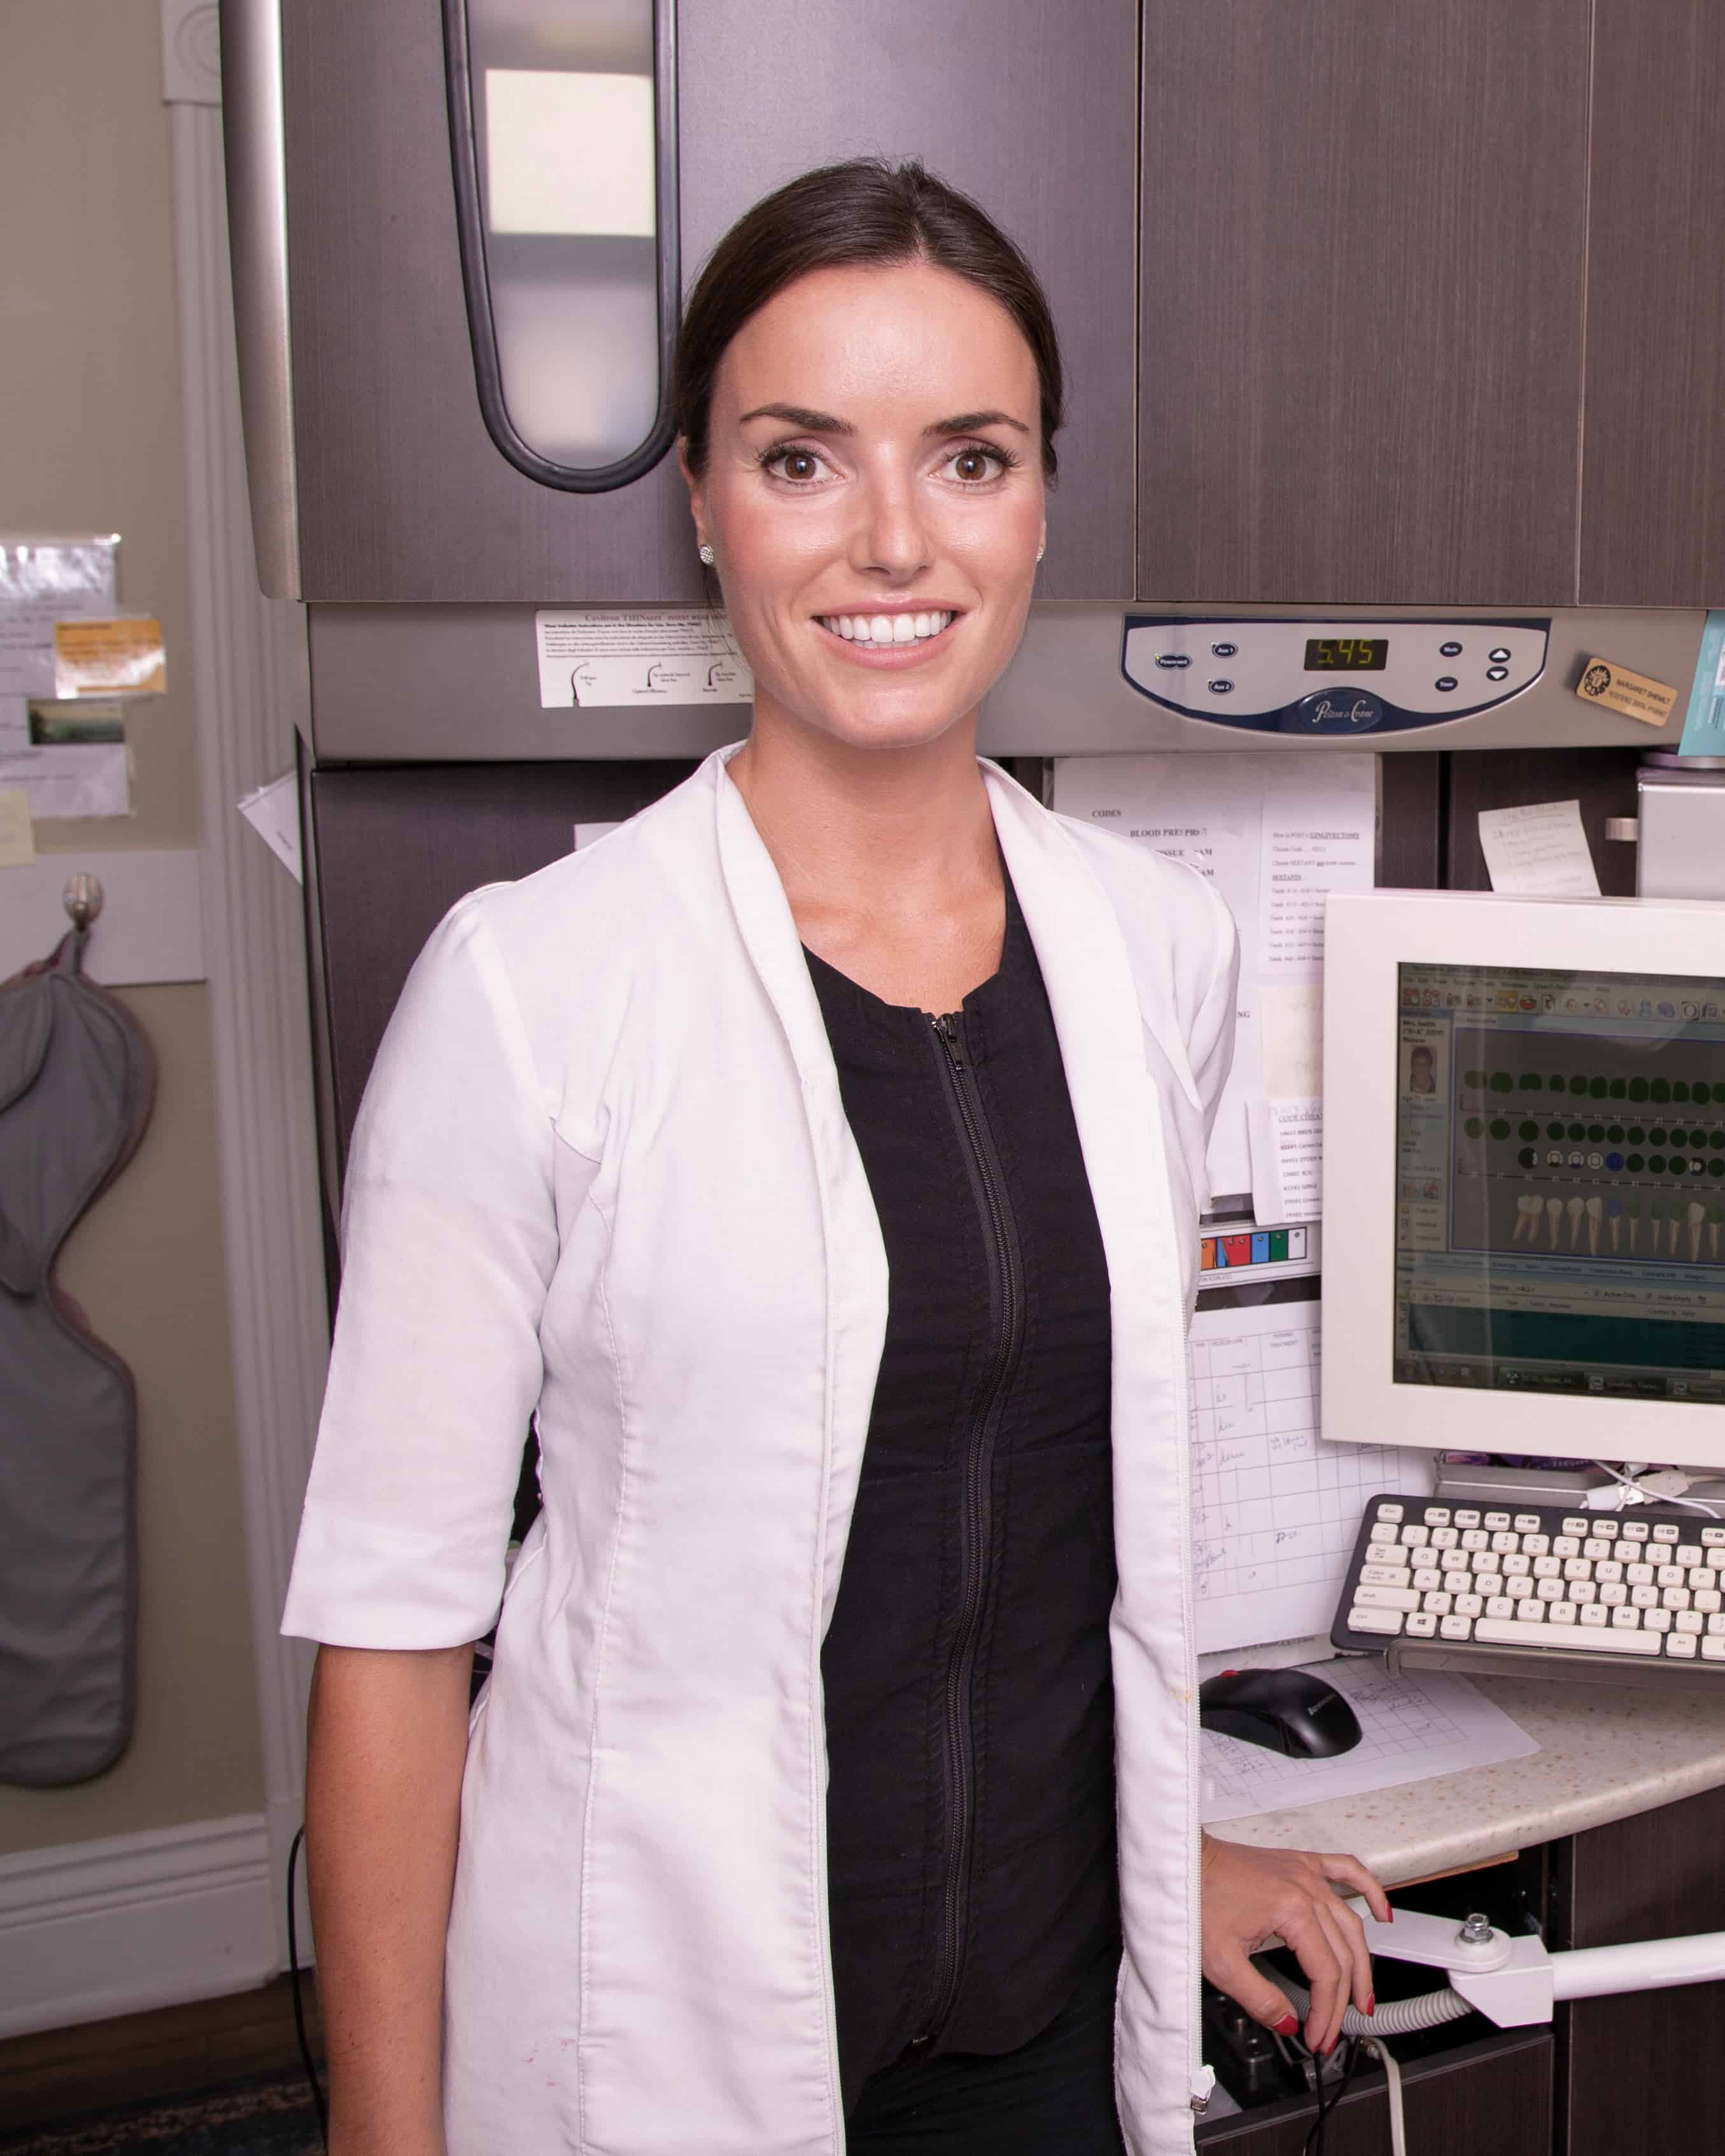 Victoria Dentist, Dr. McCrodan